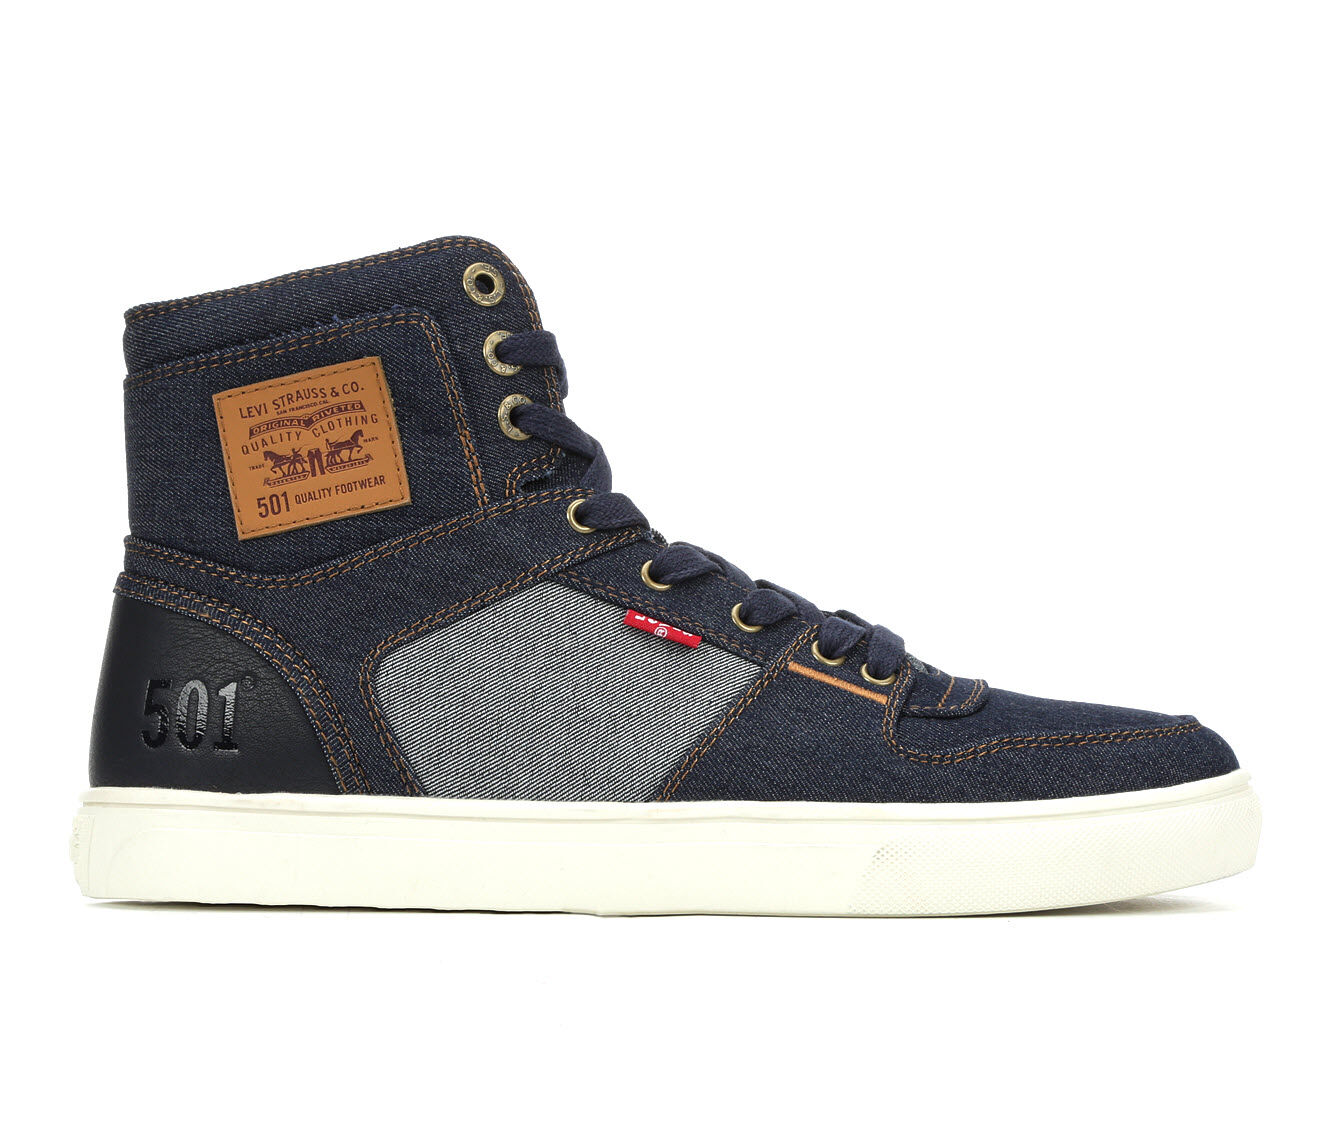 uk shoes_kd1424